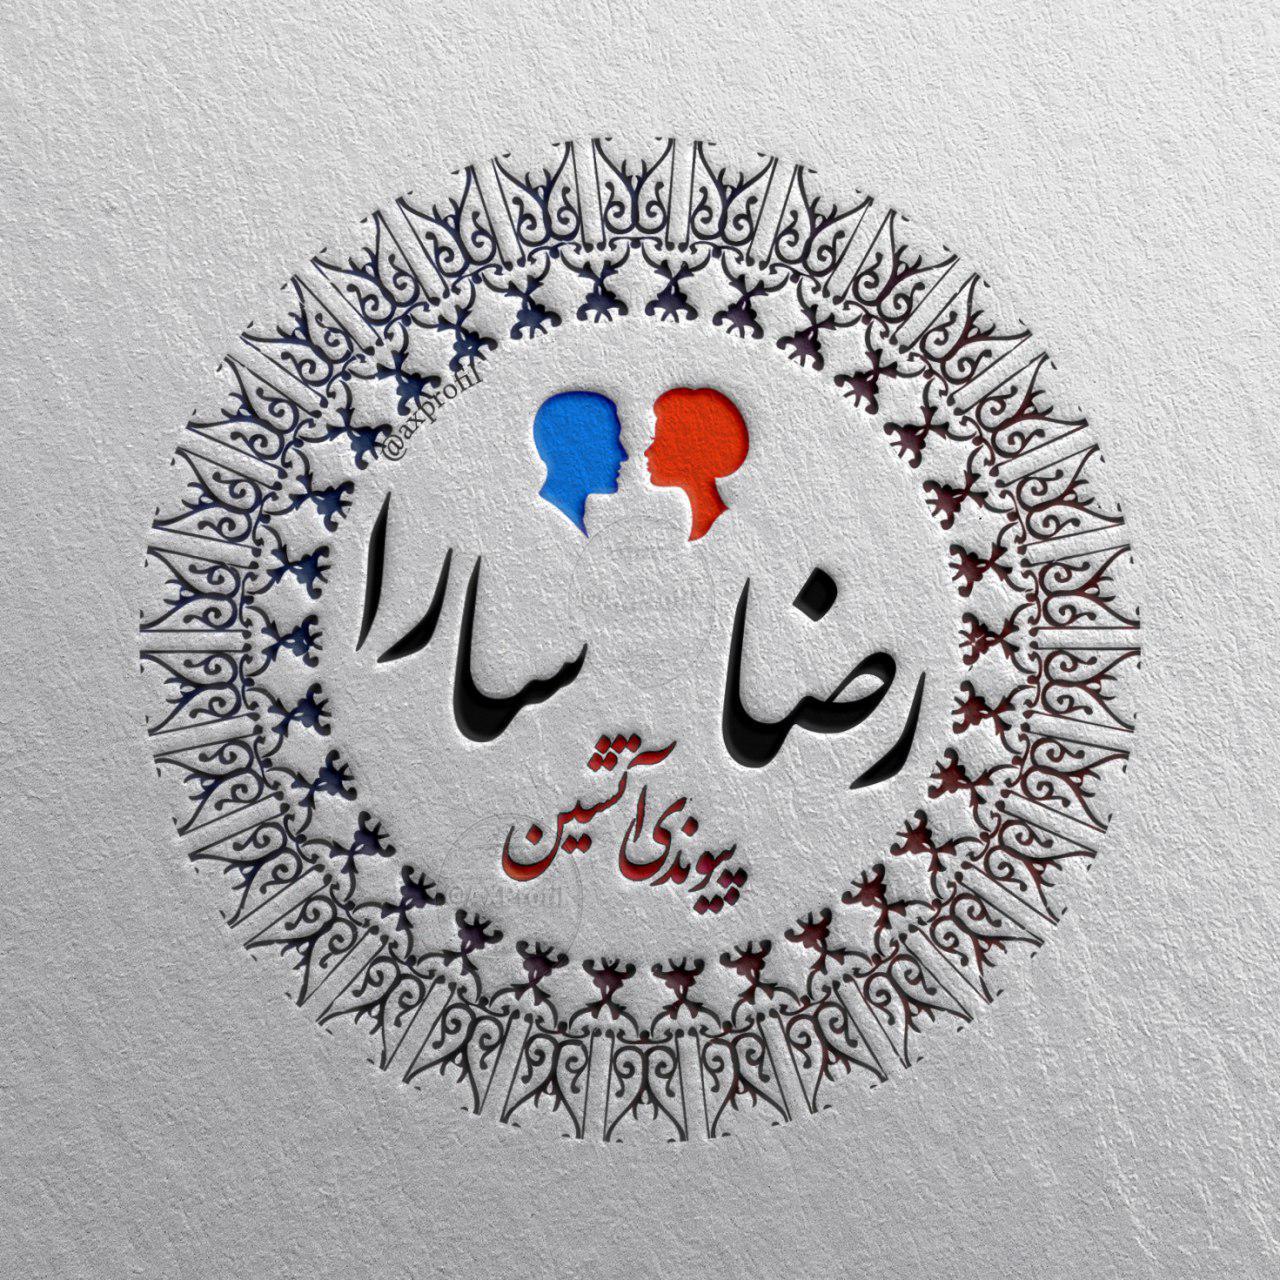 طرح گرافیکی لوگو اسم عاشقانه اسم رضا و سارا